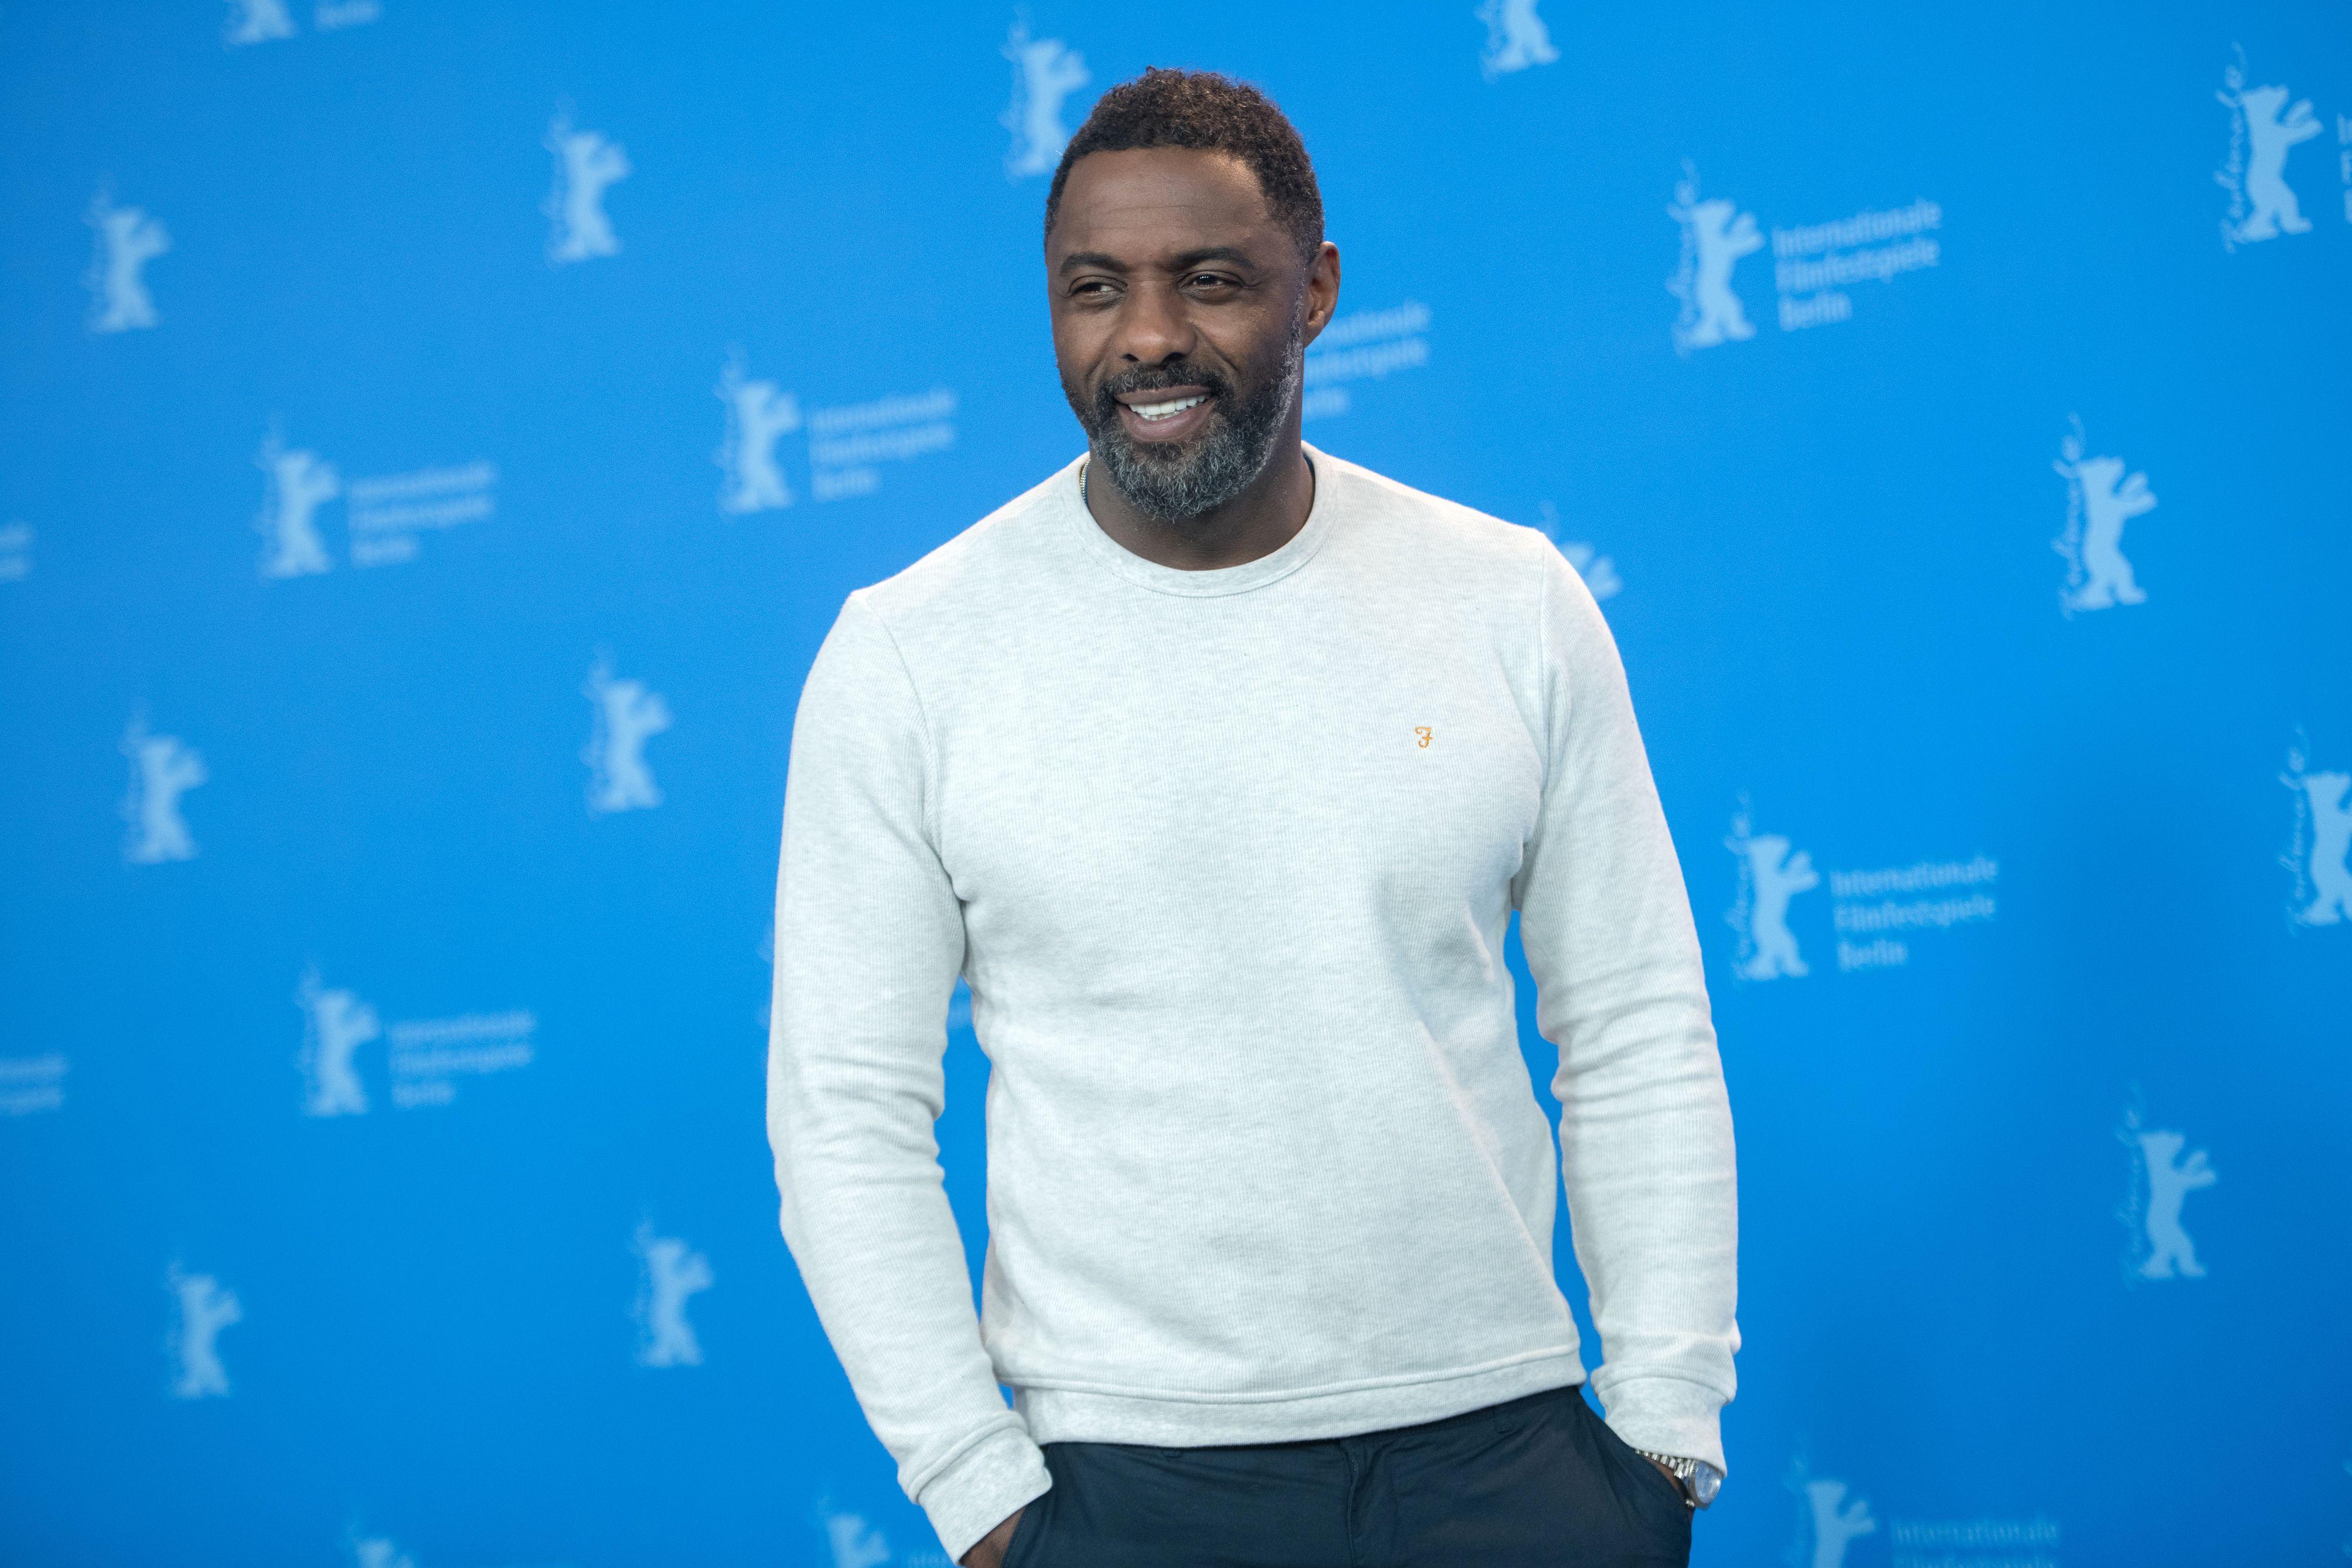 e7b9c429825 Will Idris Elba be the next James Bond  Speculation reignites - CBS News